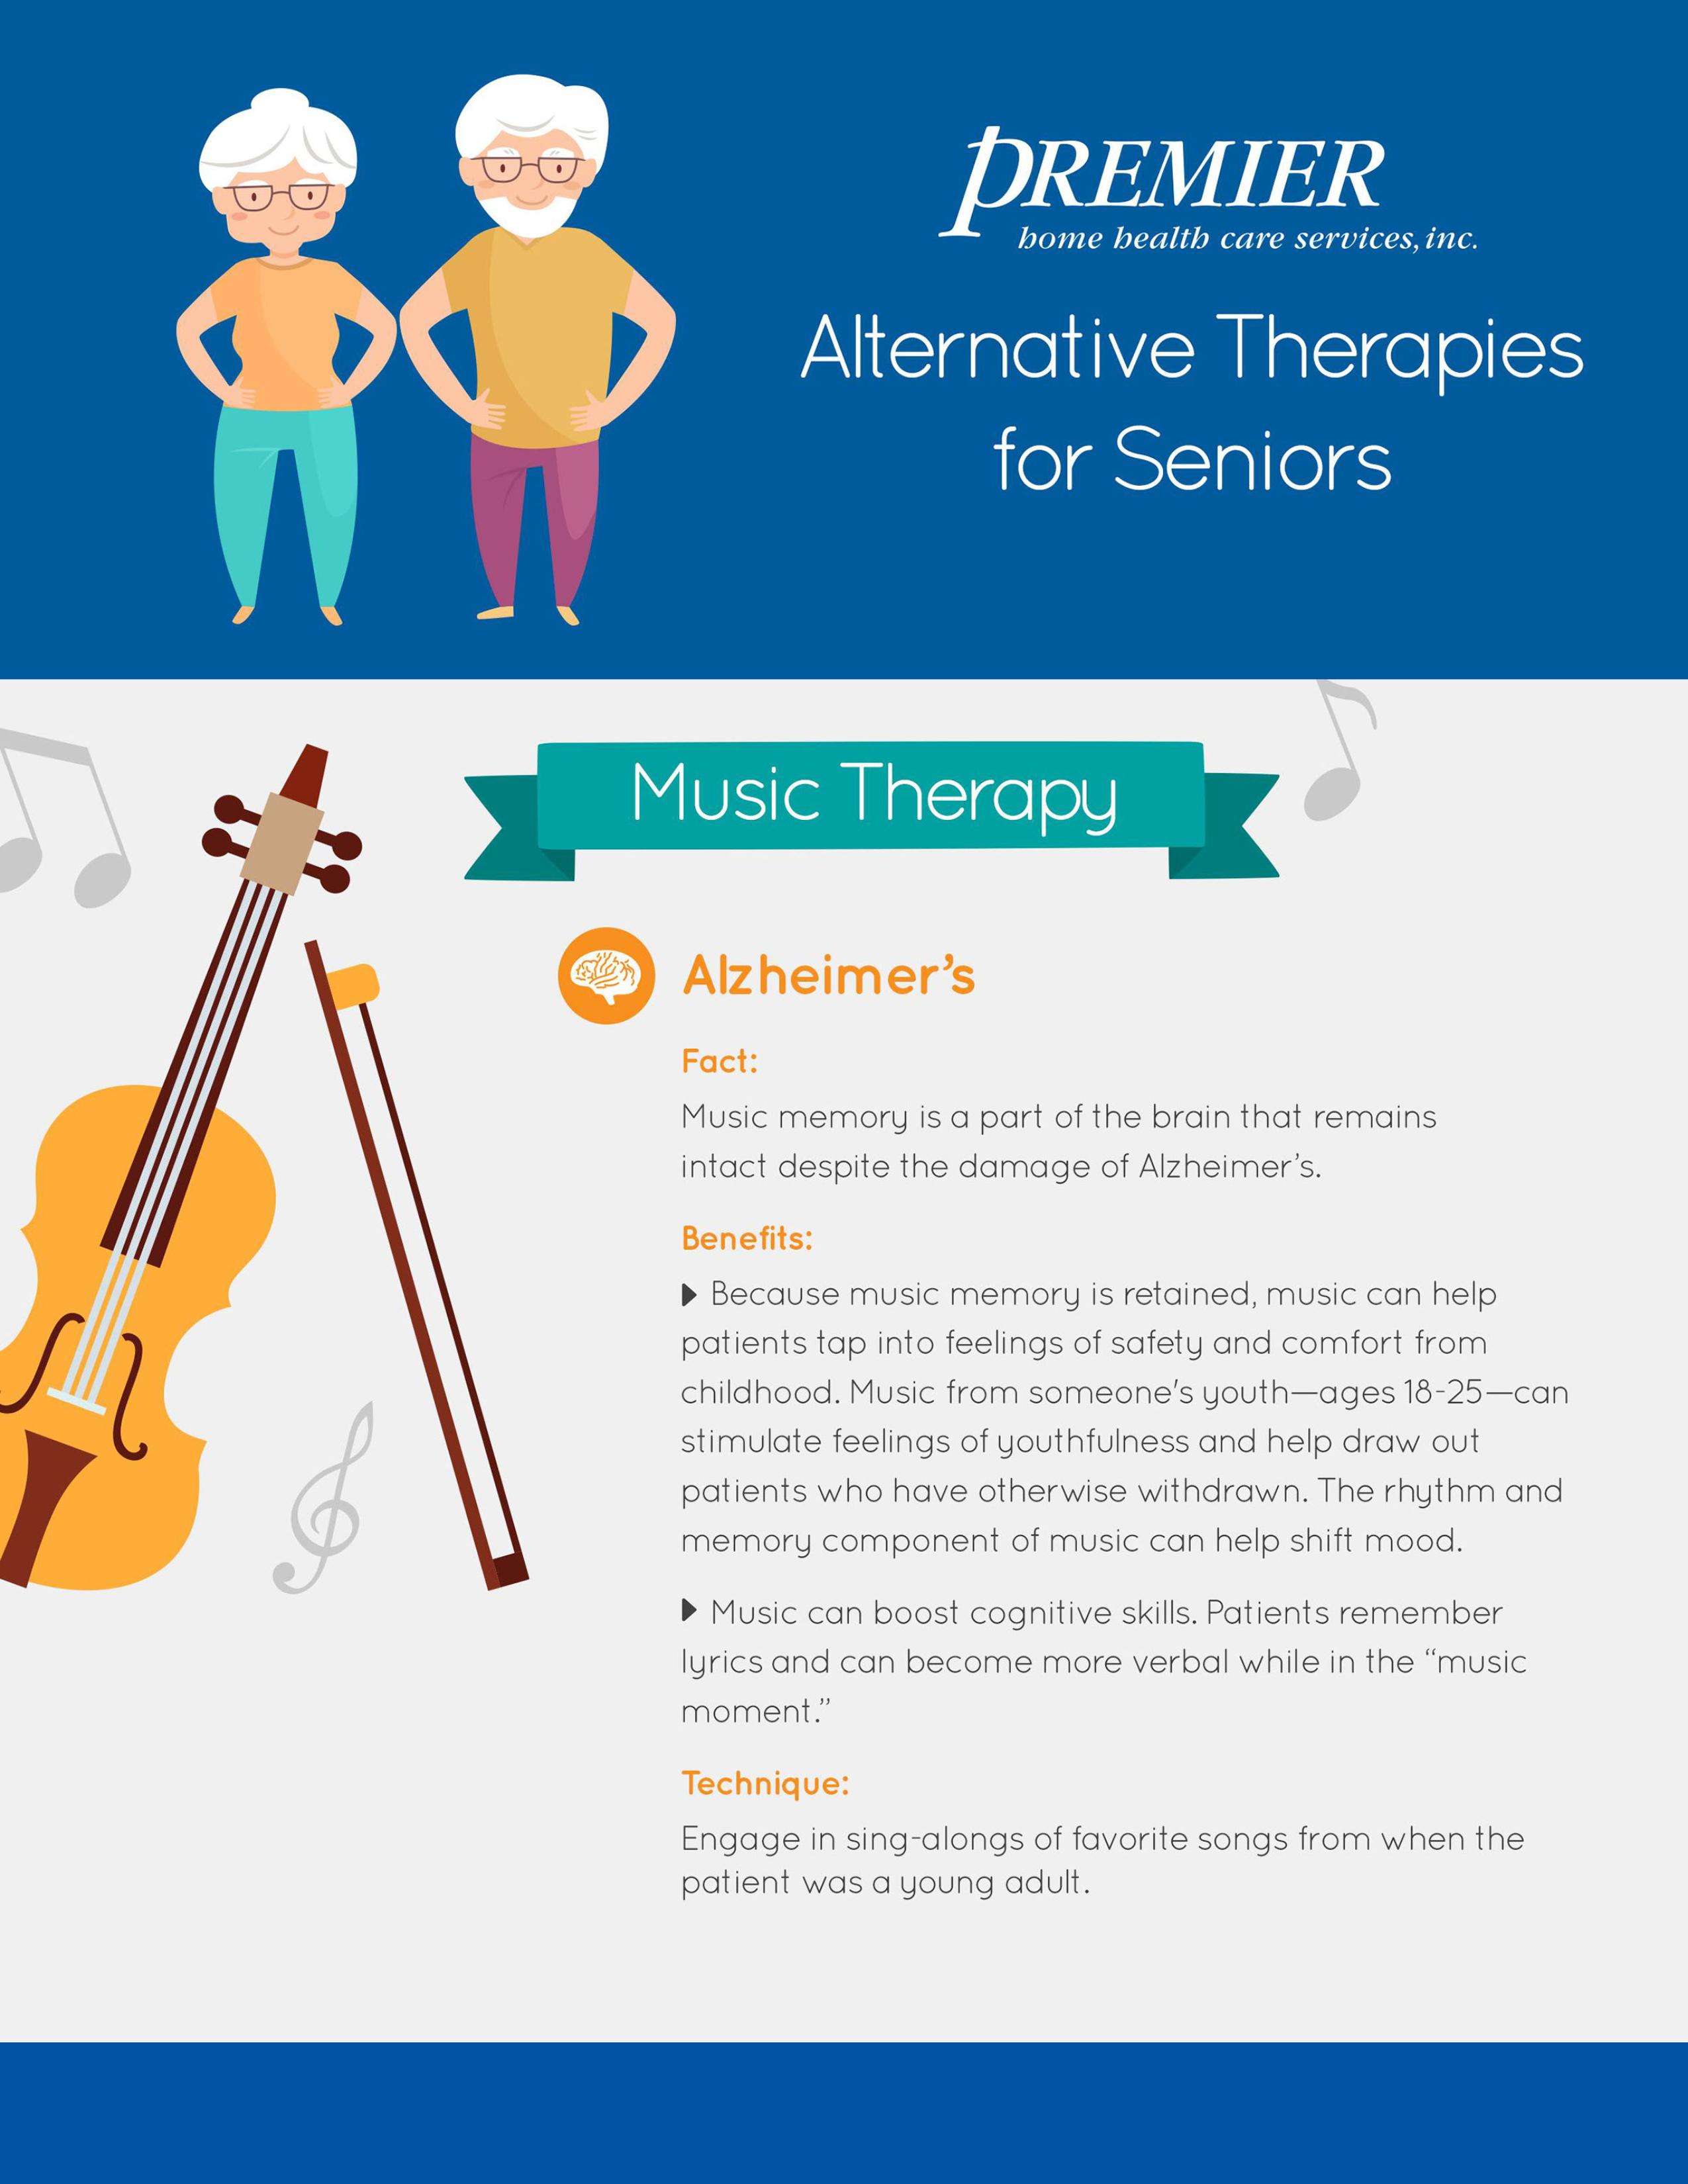 Alternative Therapies for Seniors